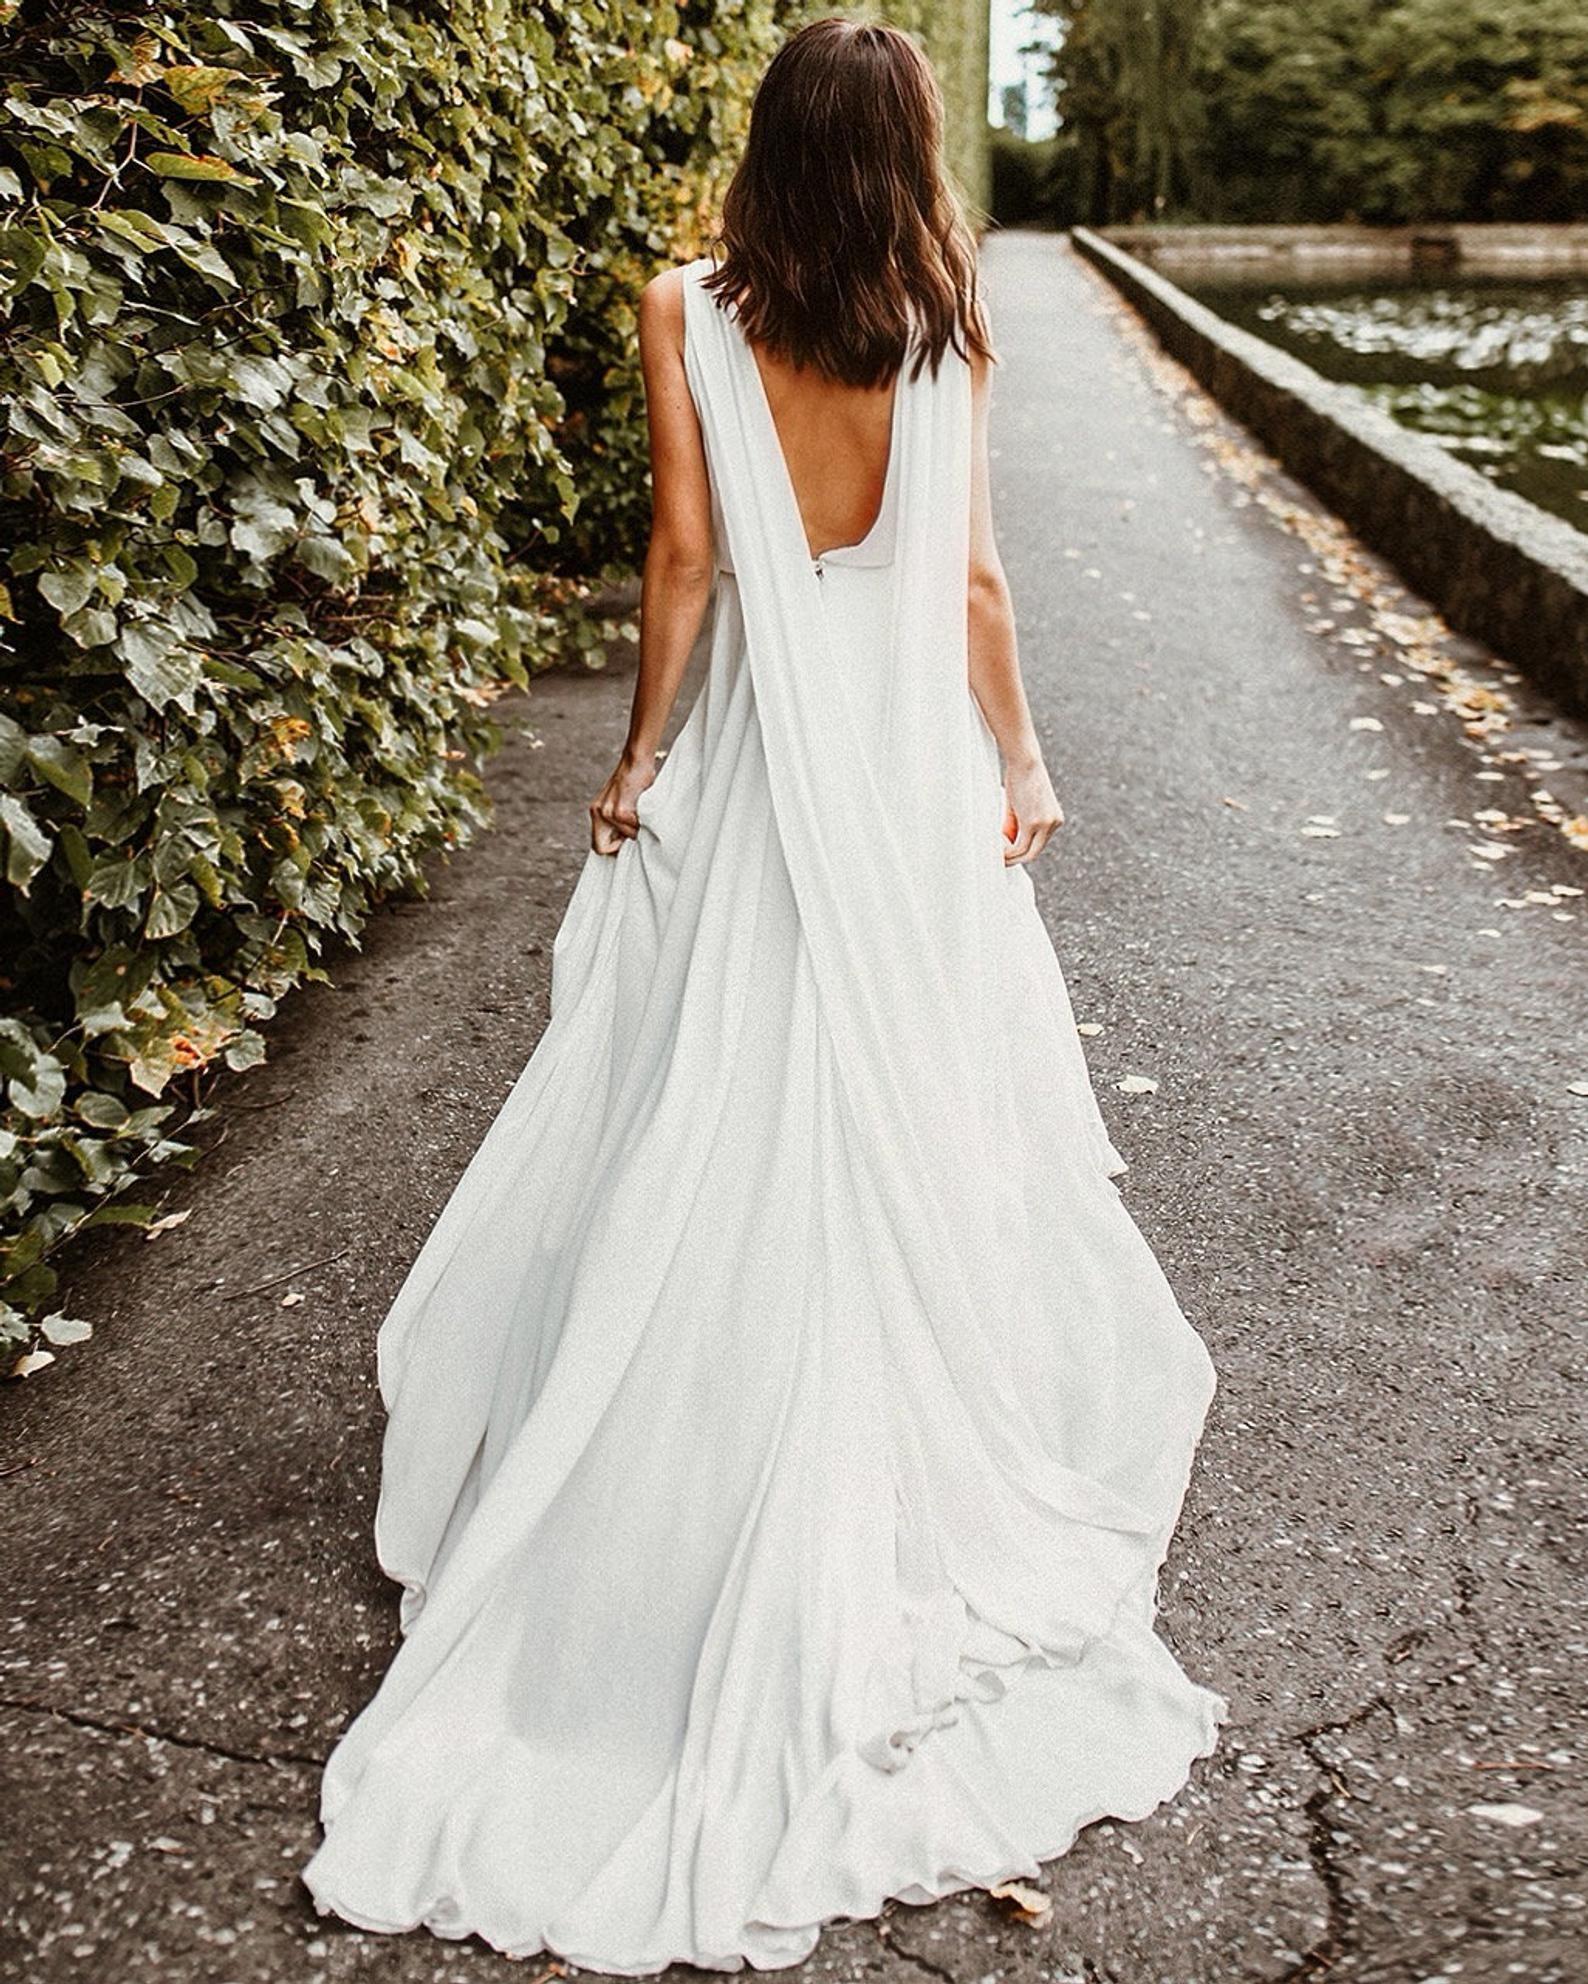 Minimal And Elegant Wedding Dressivory Wedding Gownchiffon Etsy In 2021 Wedding Dresses Modern Wedding Gown Ivory Wedding Gown [ 1984 x 1588 Pixel ]